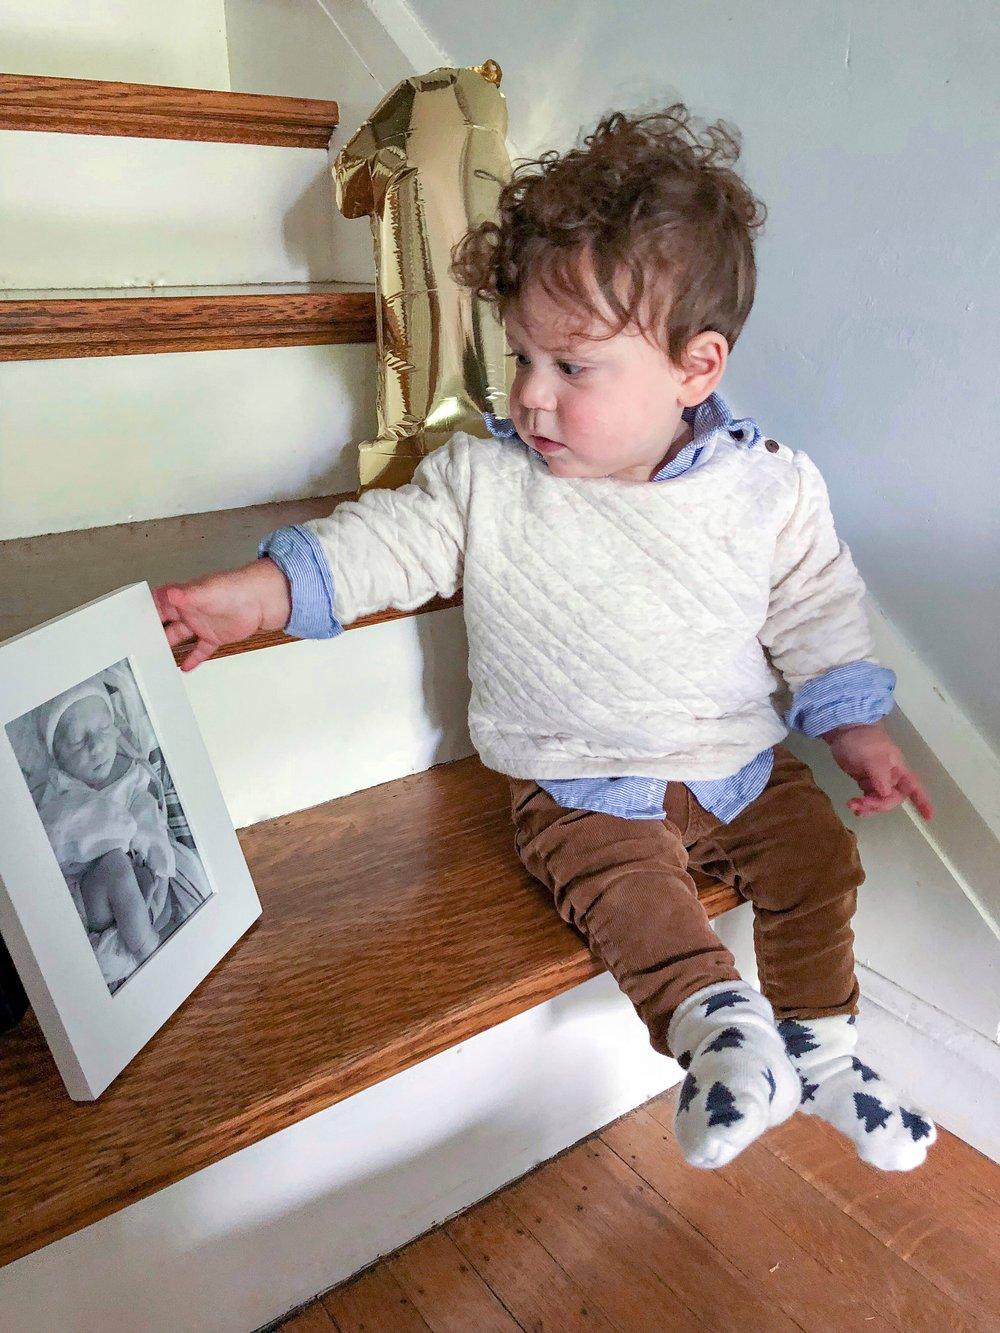 Dominic holding his newborn photo